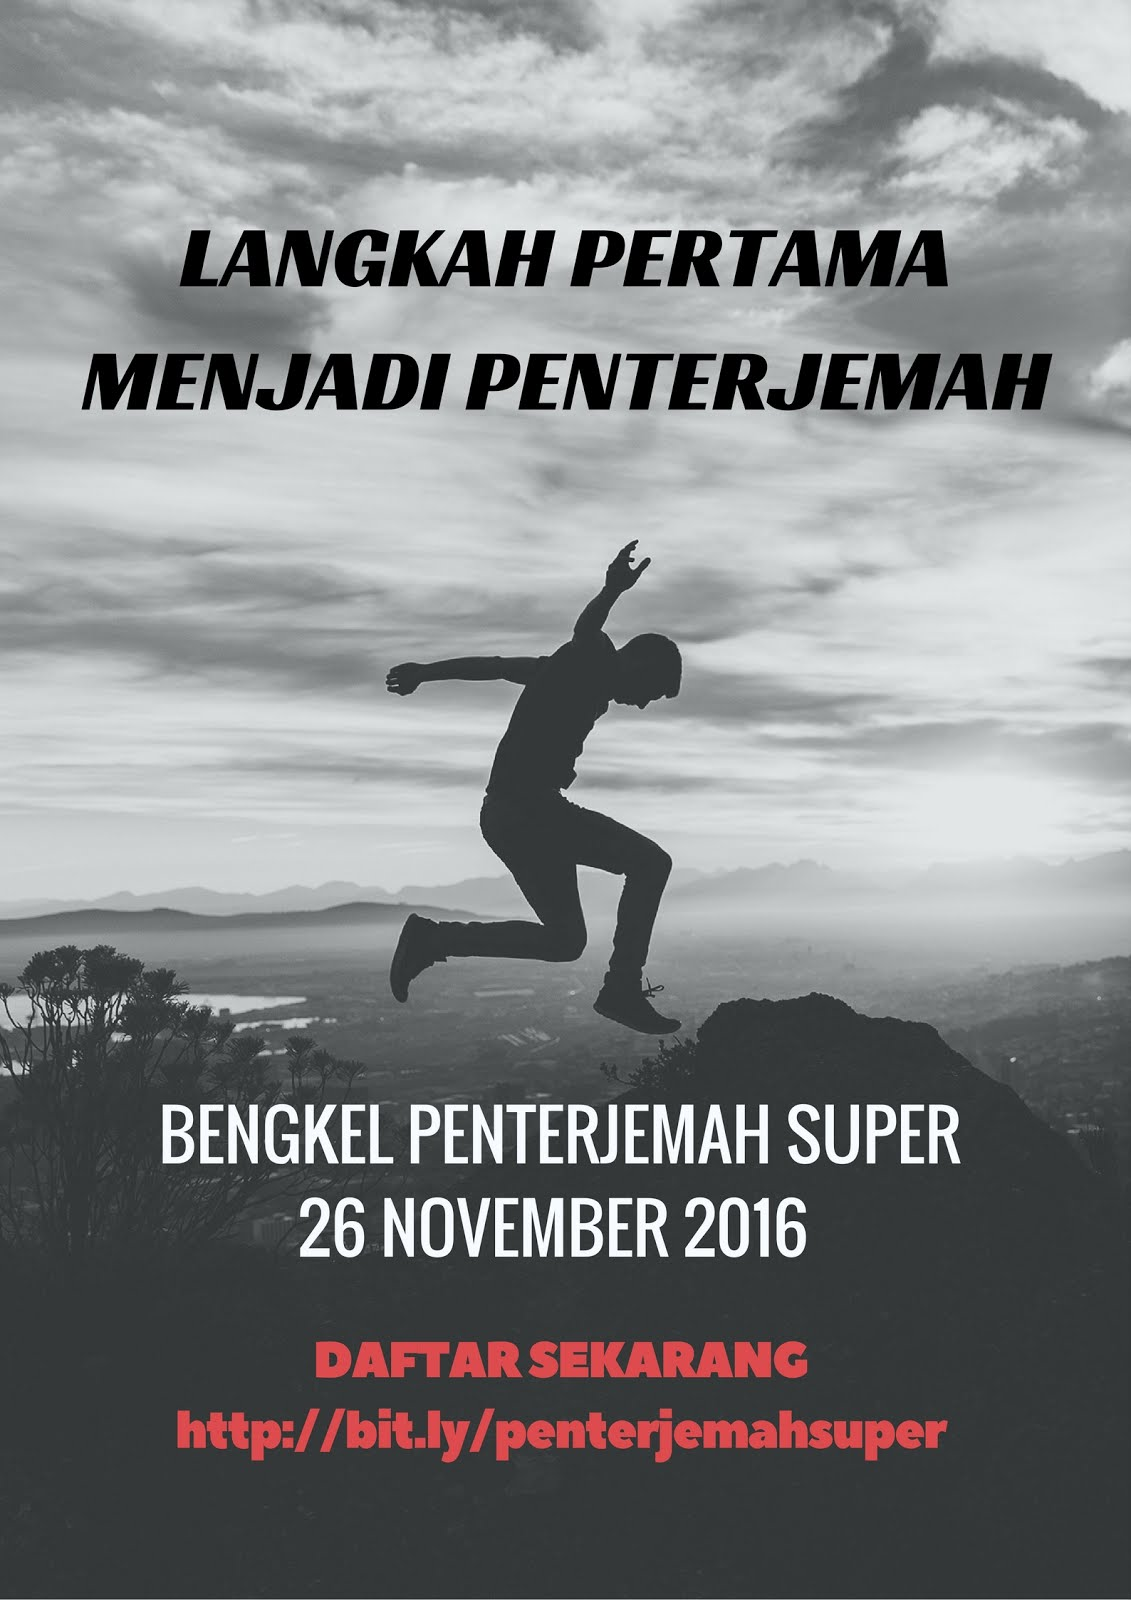 Bengkel Penterjemah Super 26 Nov 2016